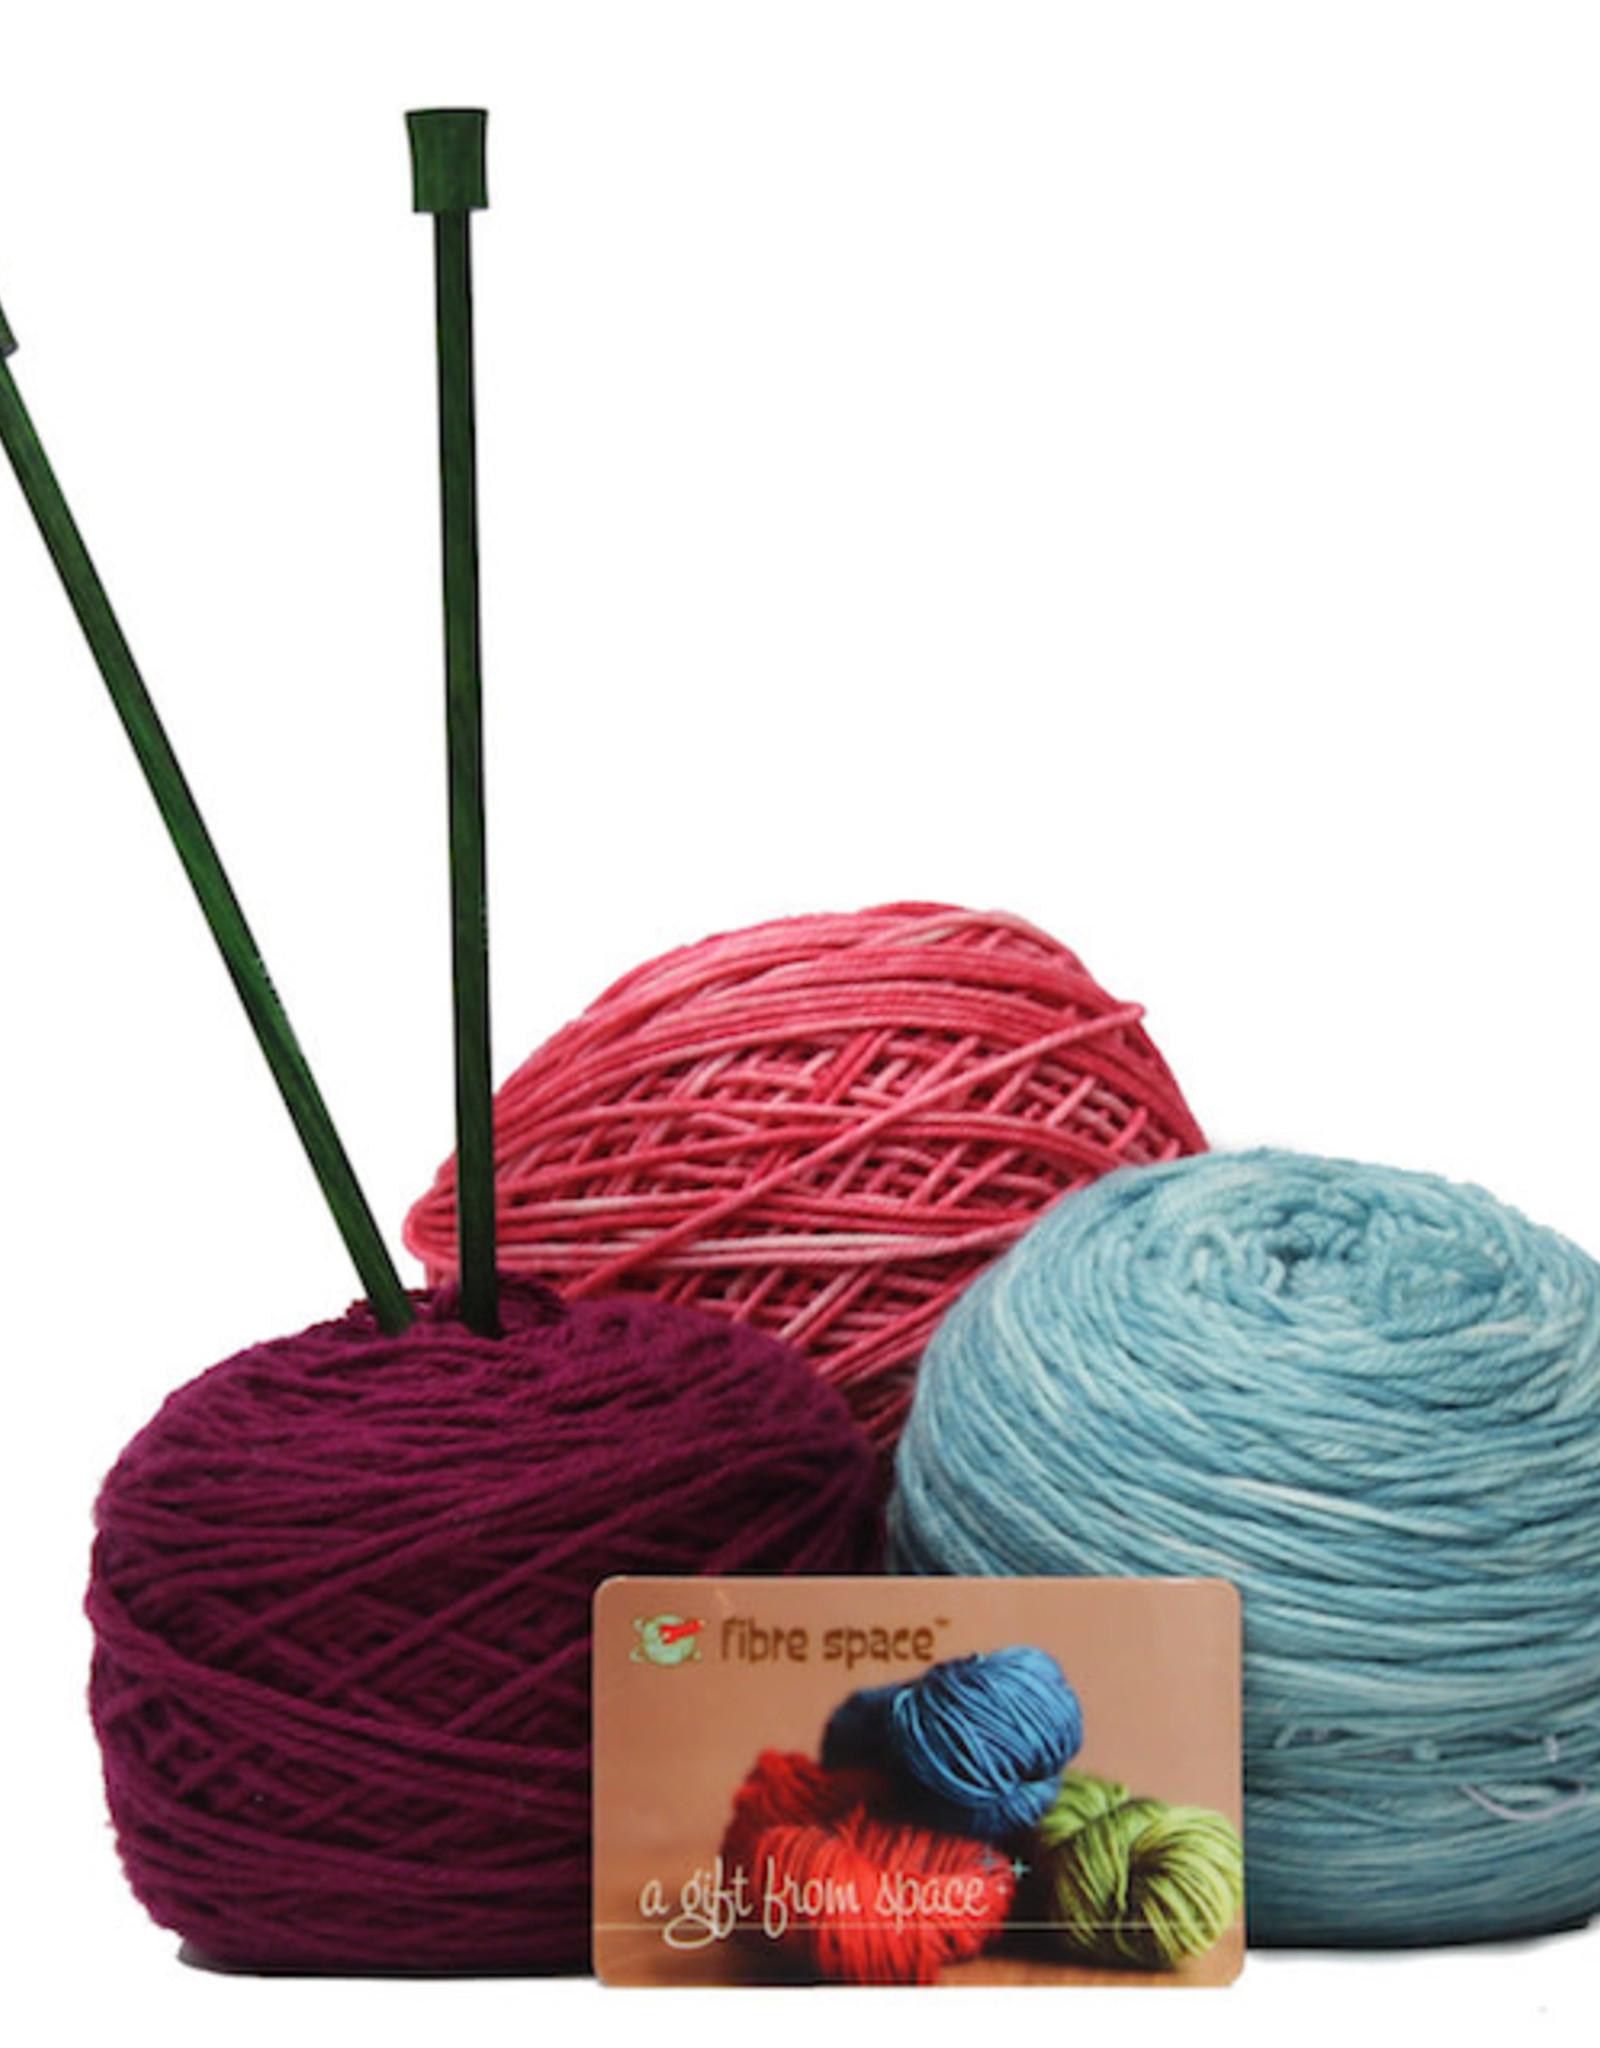 fibre space Gift Card - $75